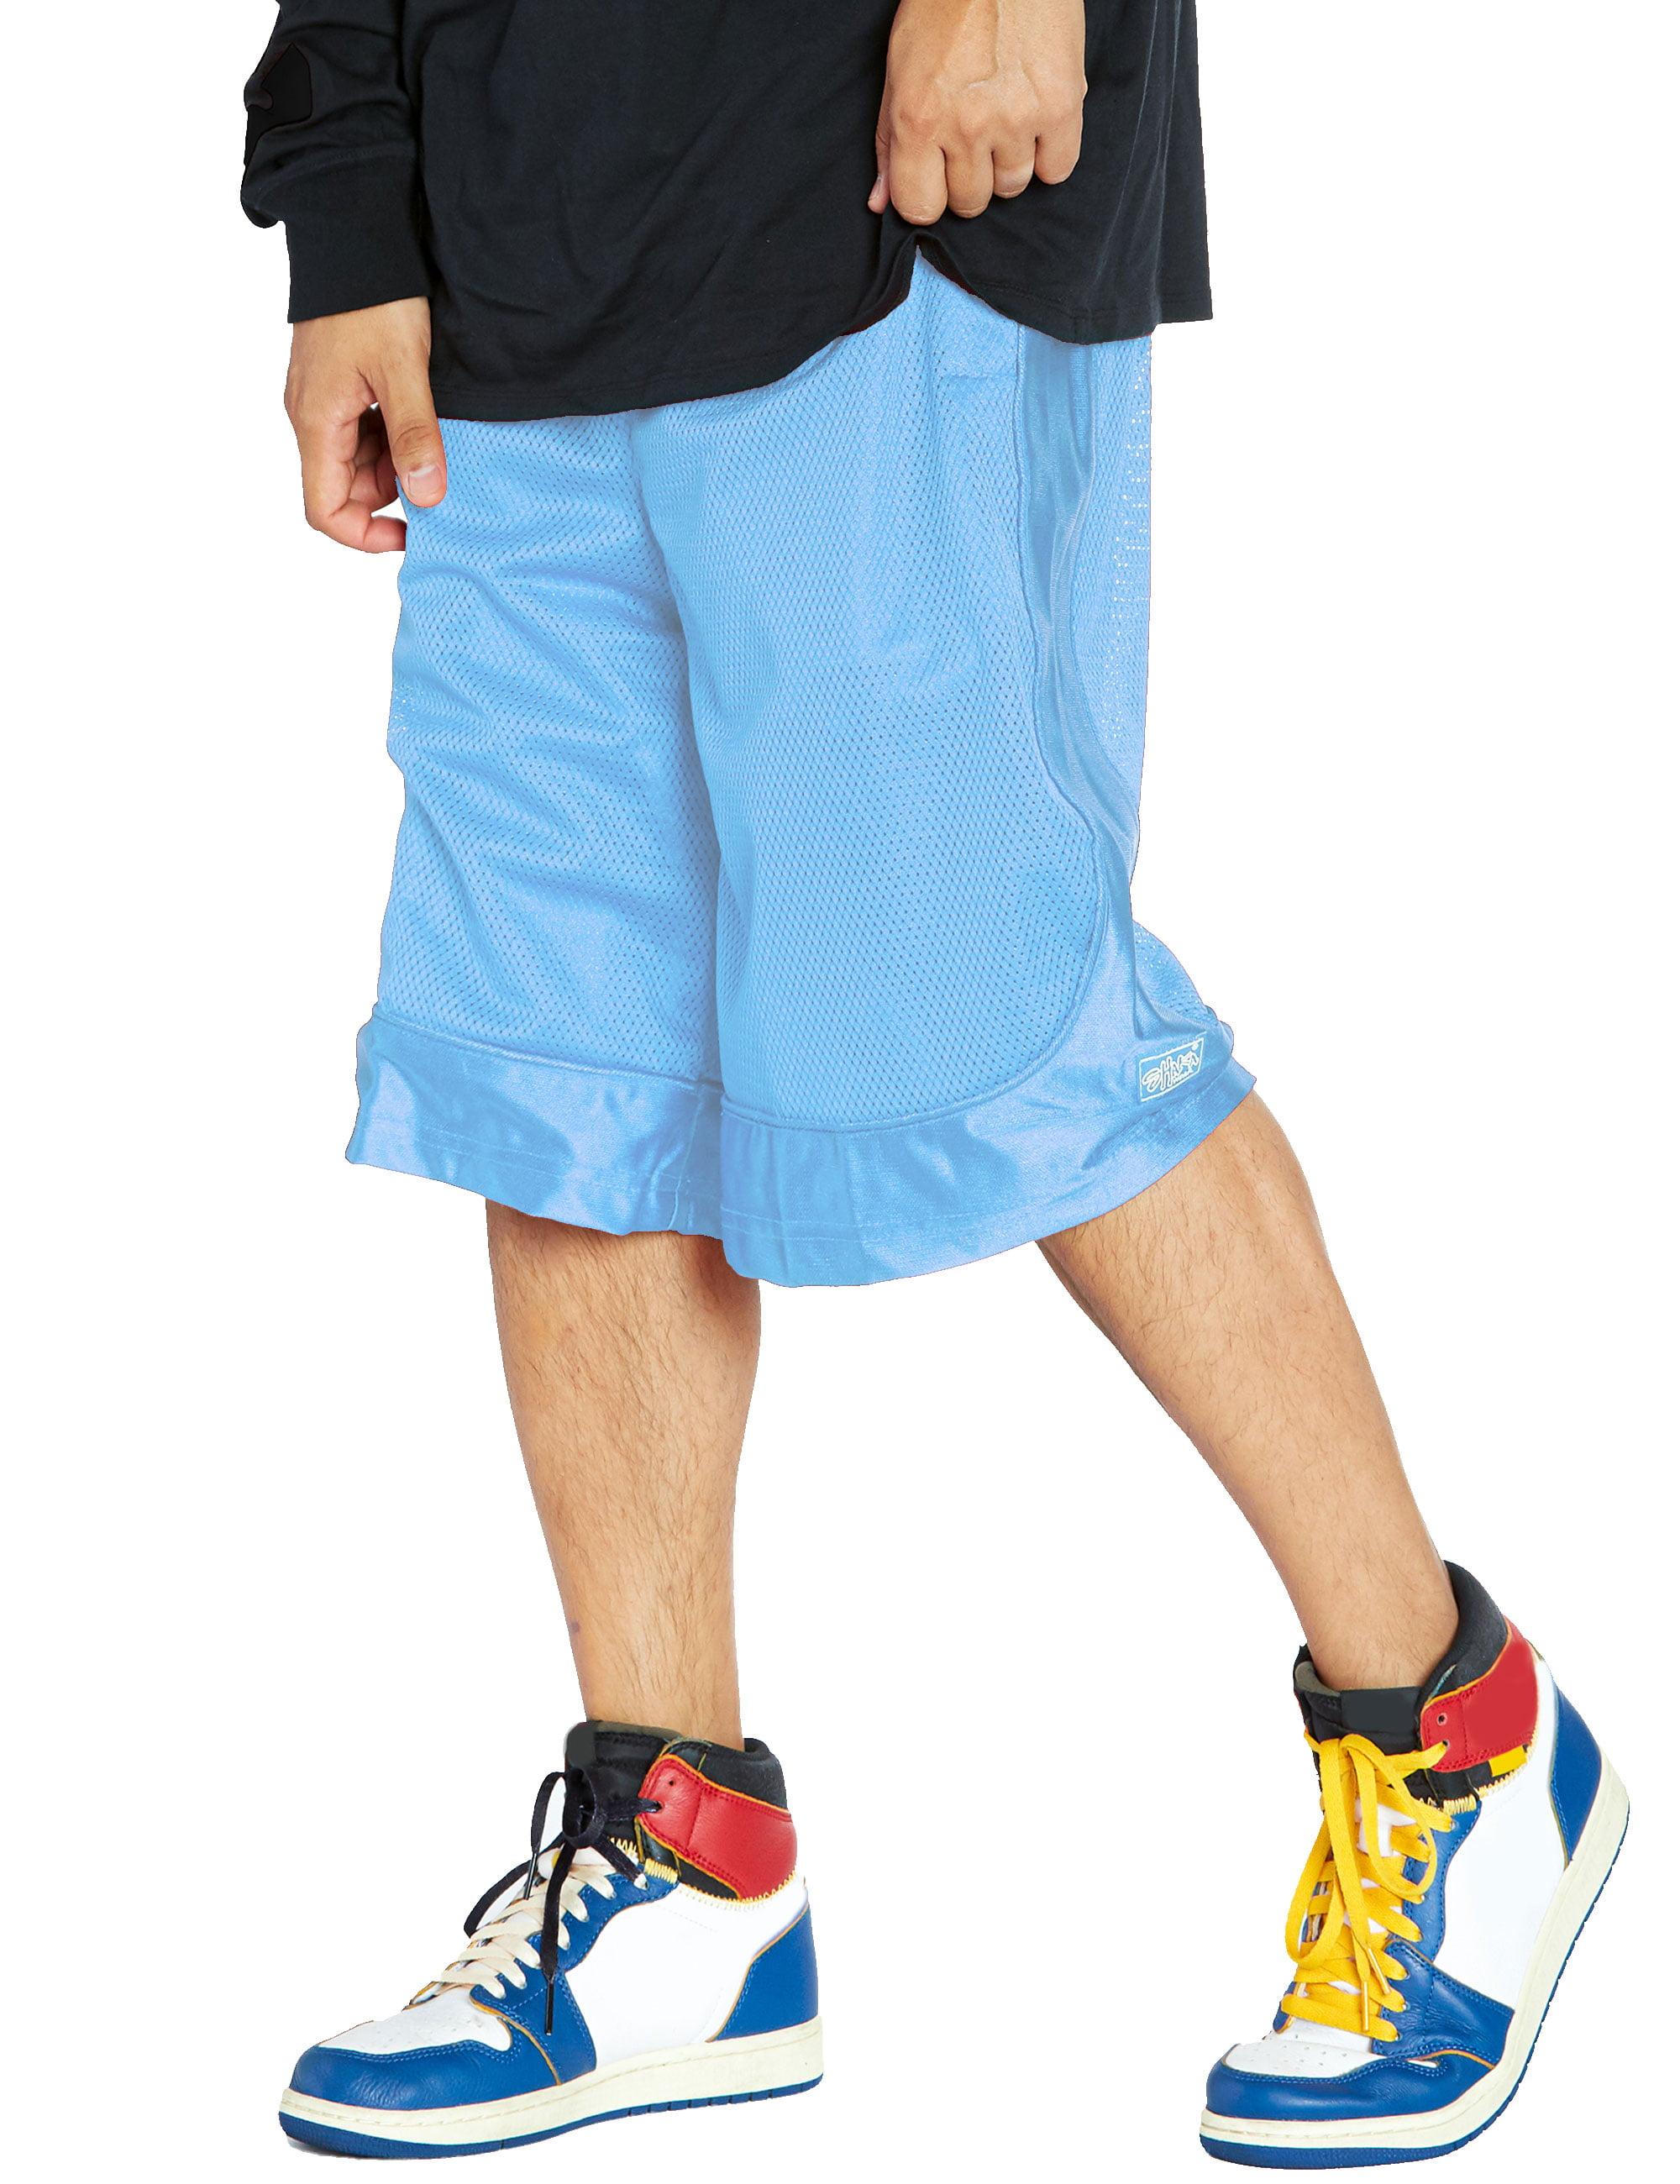 Shaka Wear Mens Mesh Basketball Shorts Free Shipping Any Color Size SM-5X